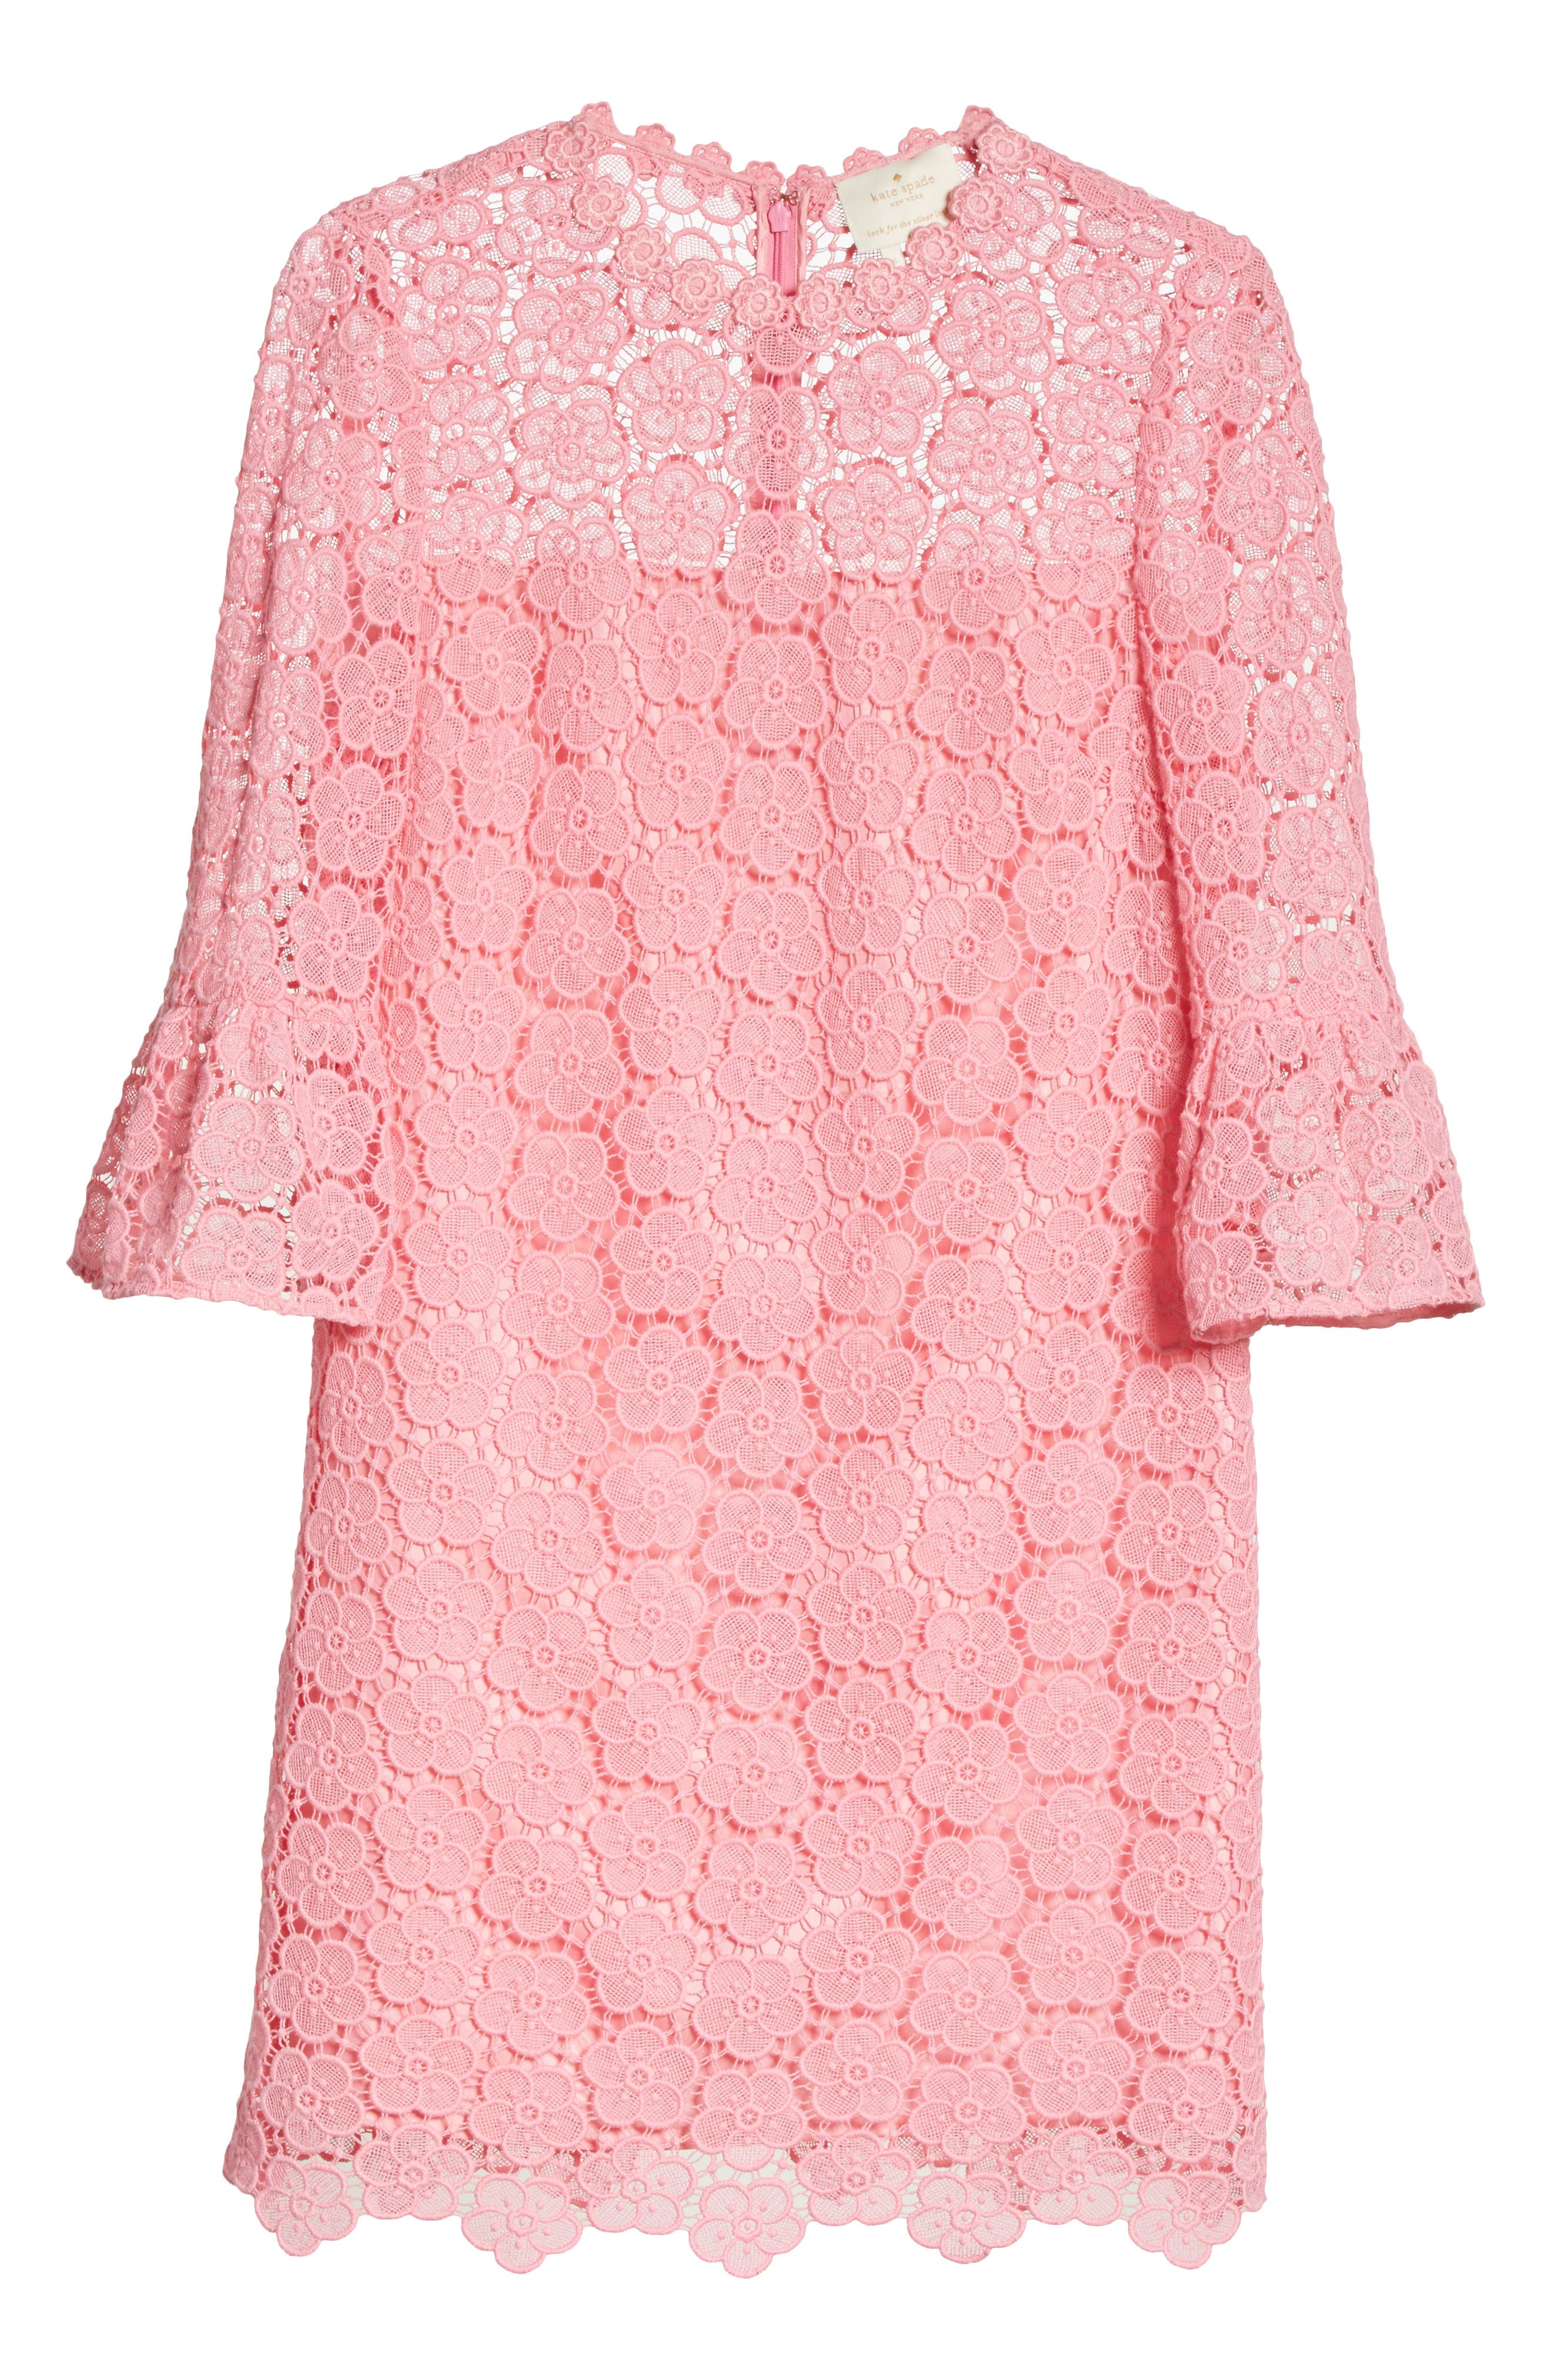 bloom flower lace shift dress,                             Alternate thumbnail 6, color,                             698